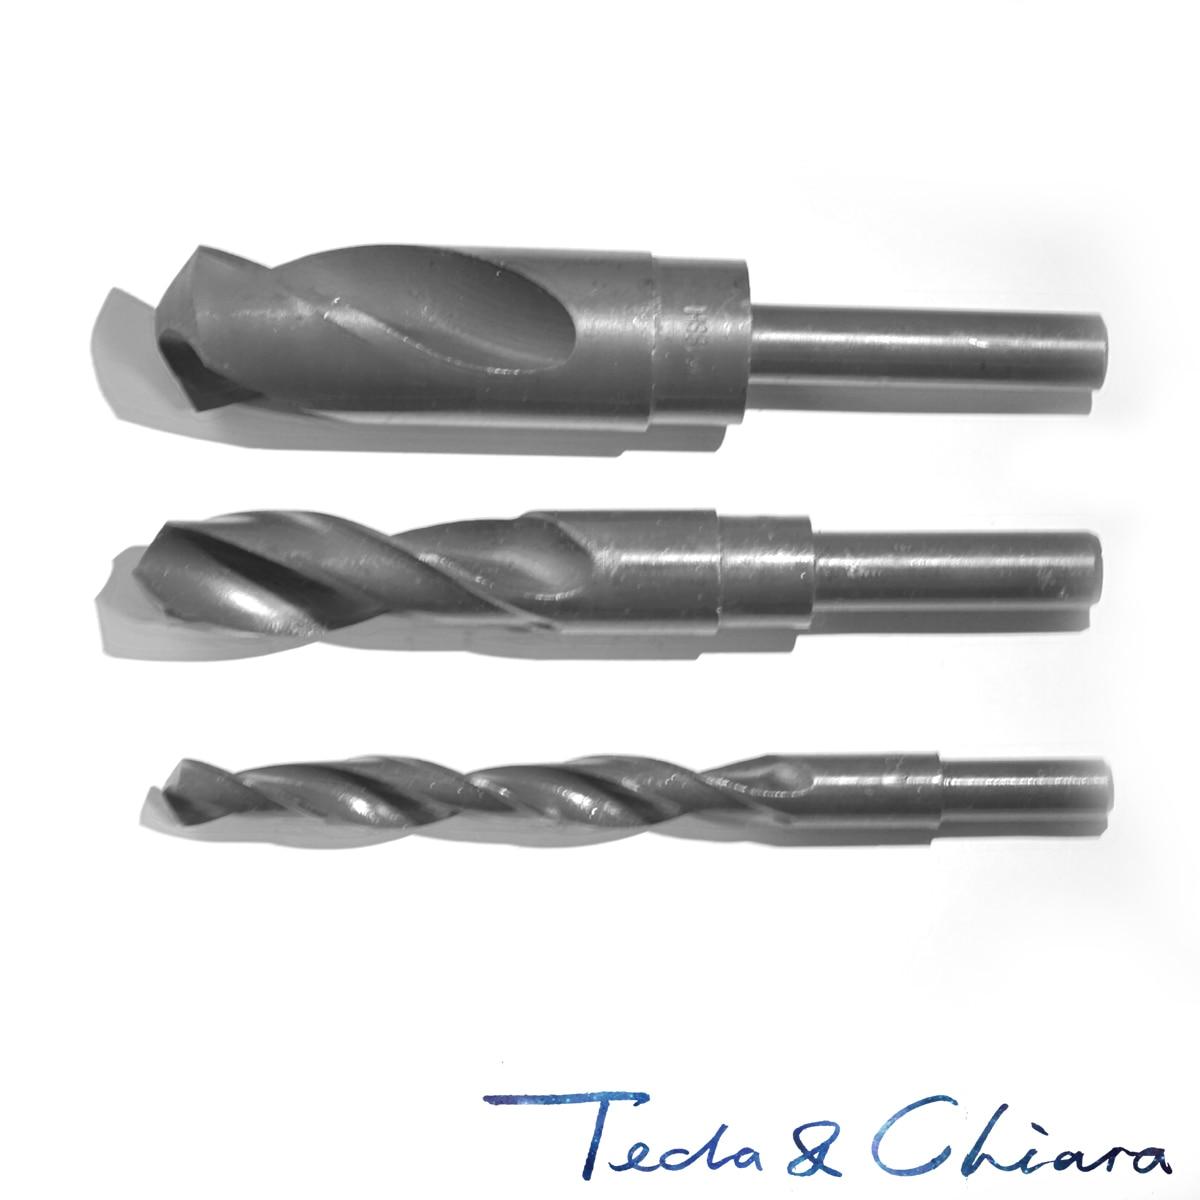 27,5mm 28mm 28,5mm 29mm HSS reducido manivela recta broca espiga diámetro 12,7mm 1/2 pulgadas 27,5 28 28,5 29